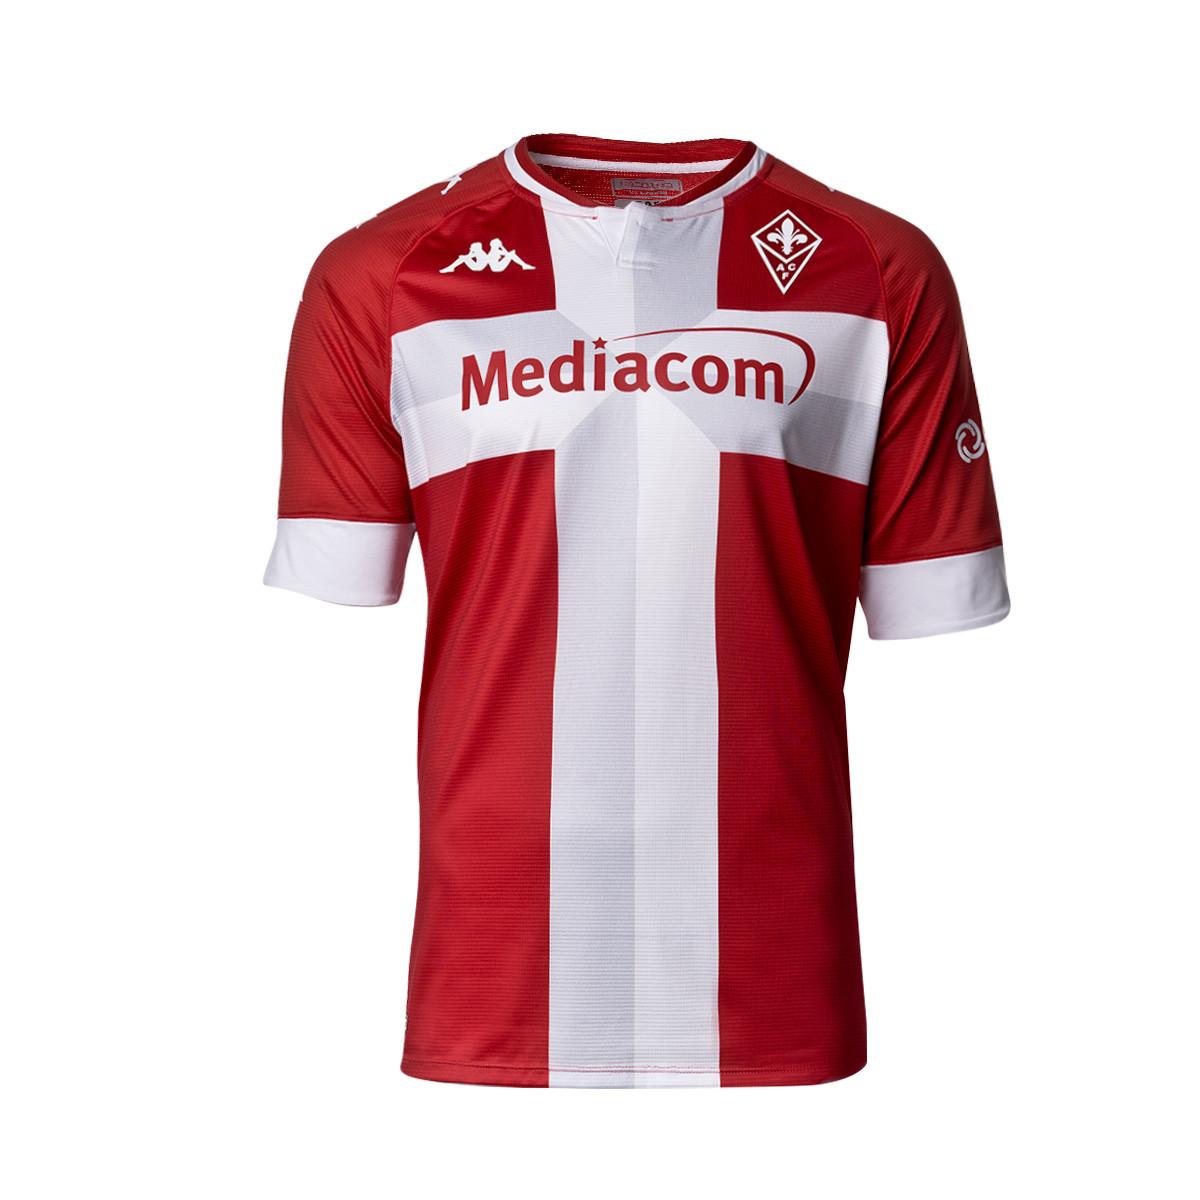 Maglia Kappa ACF Fiorentina Terzo Kit Pro 2020-2021